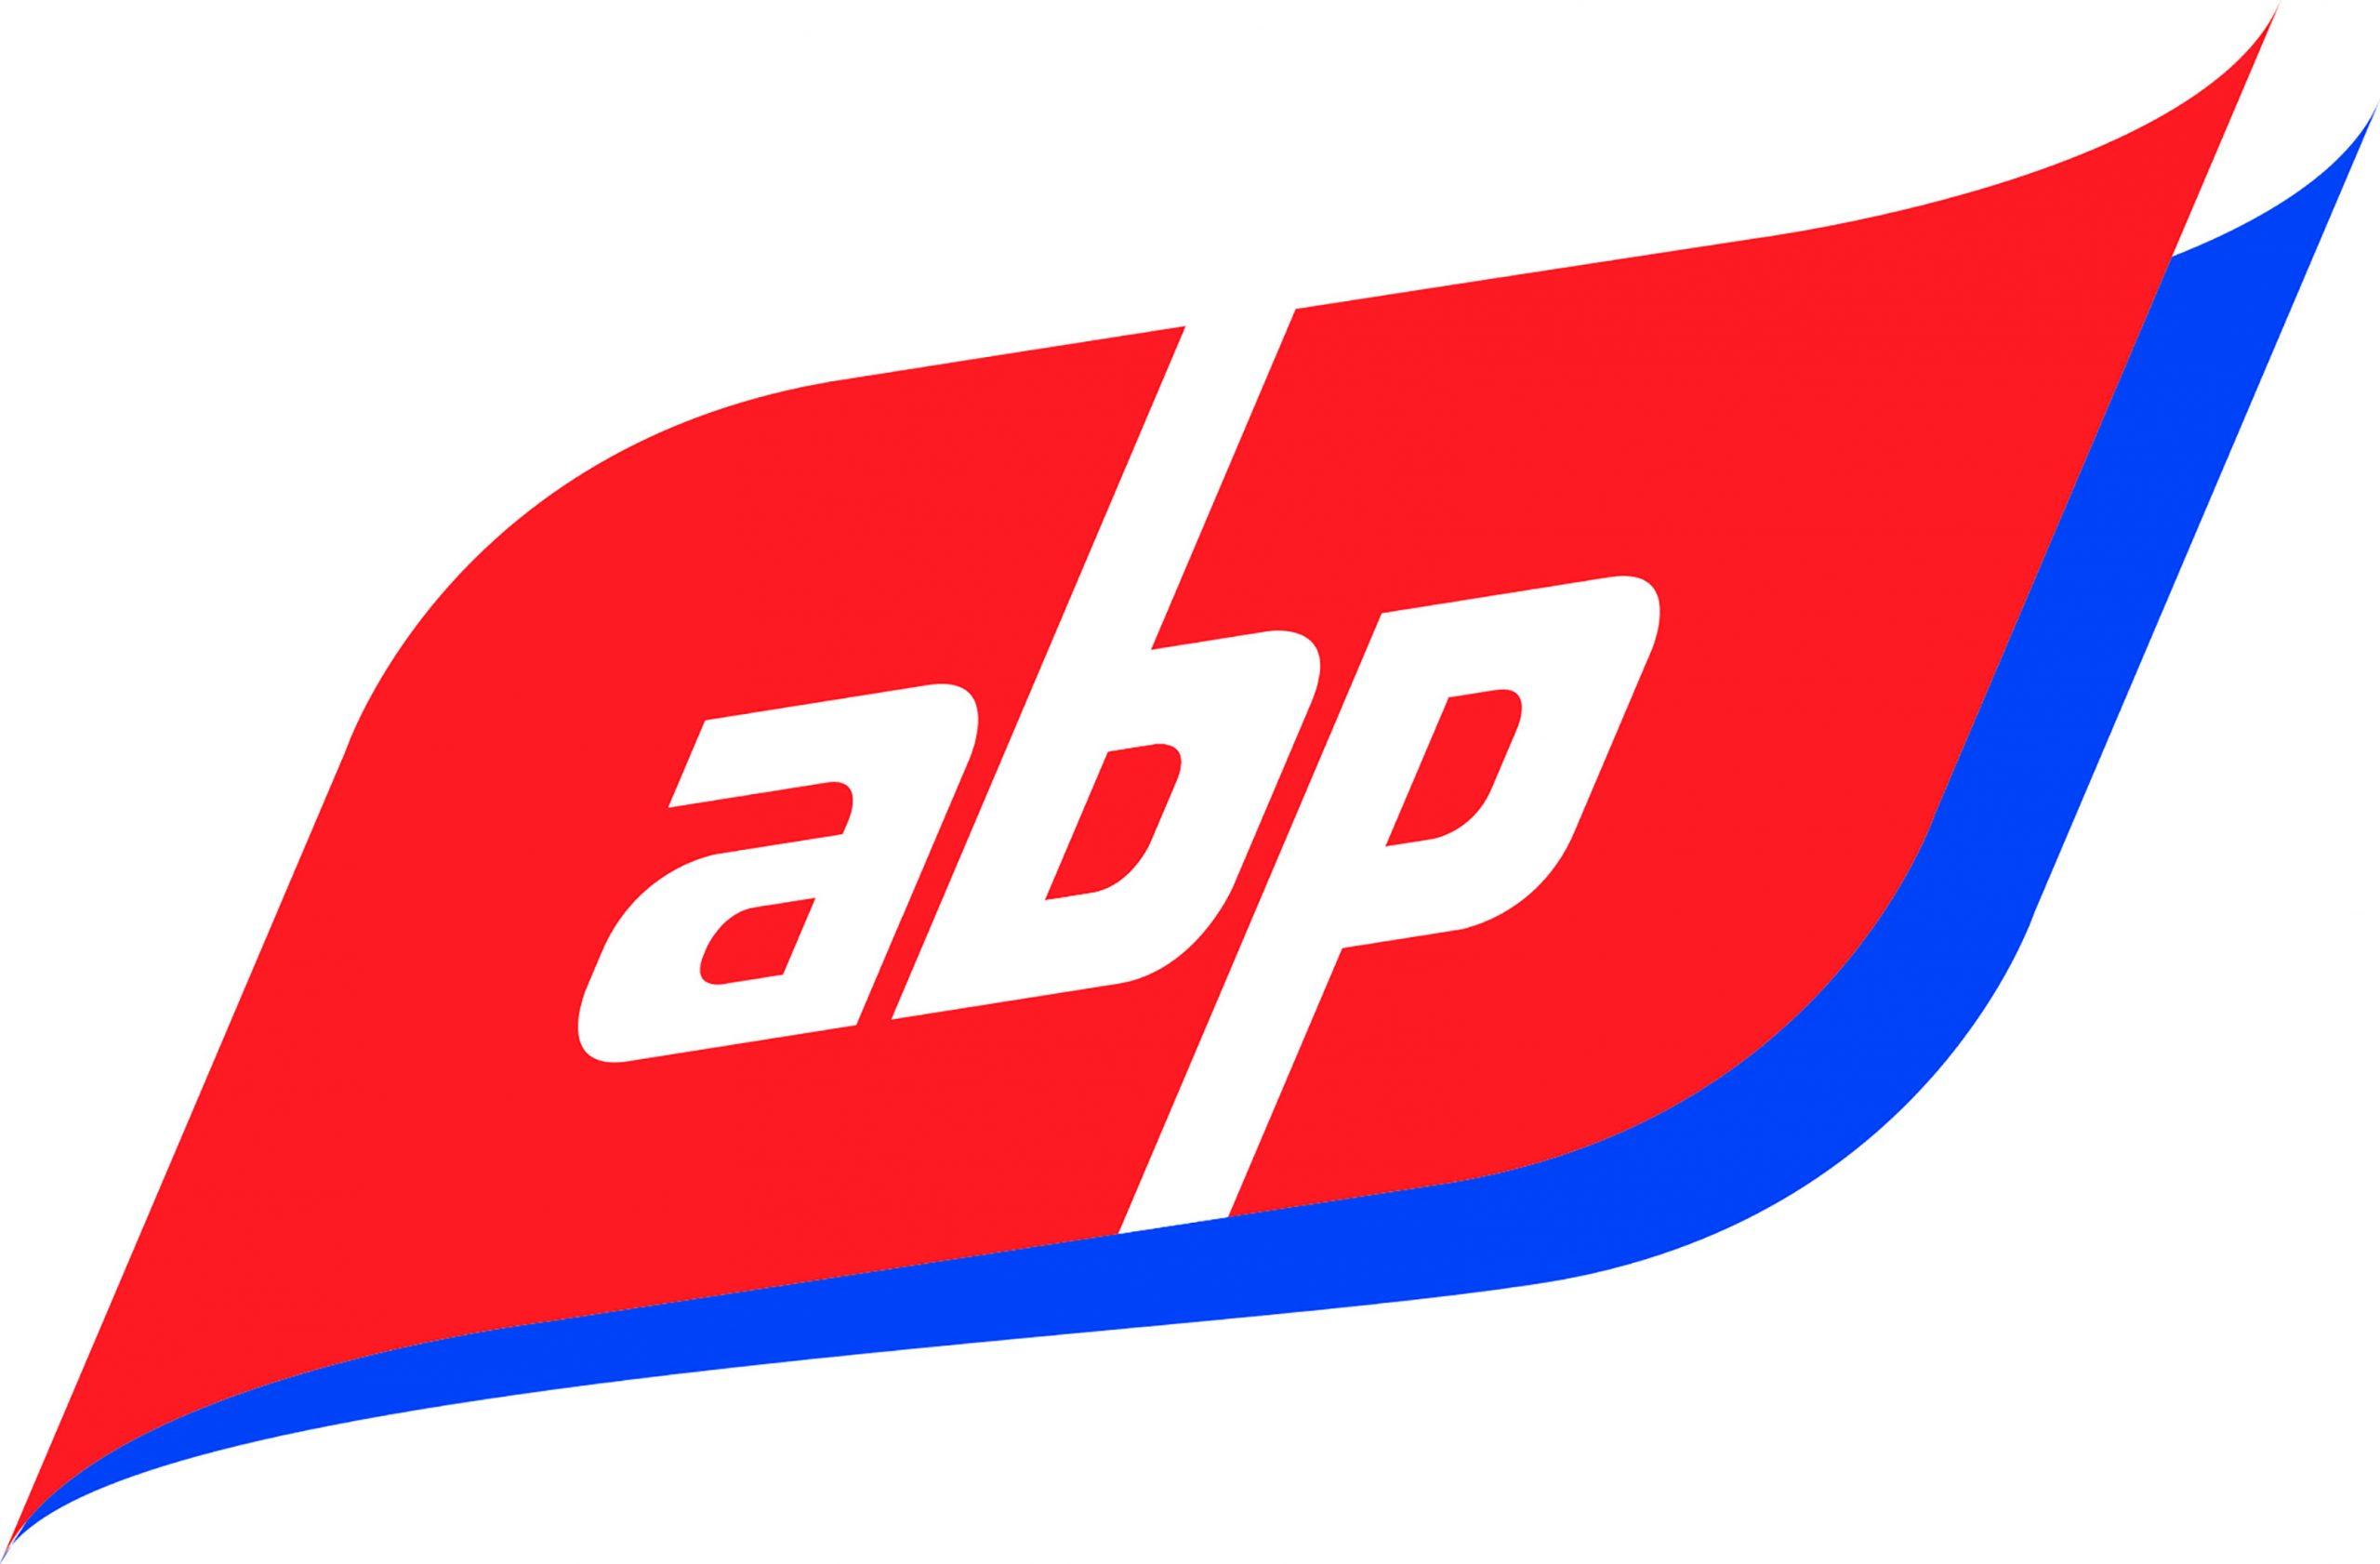 https://europeanplasticspact.org/wp-content/uploads/2021/05/abp_logo-scaled.jpg